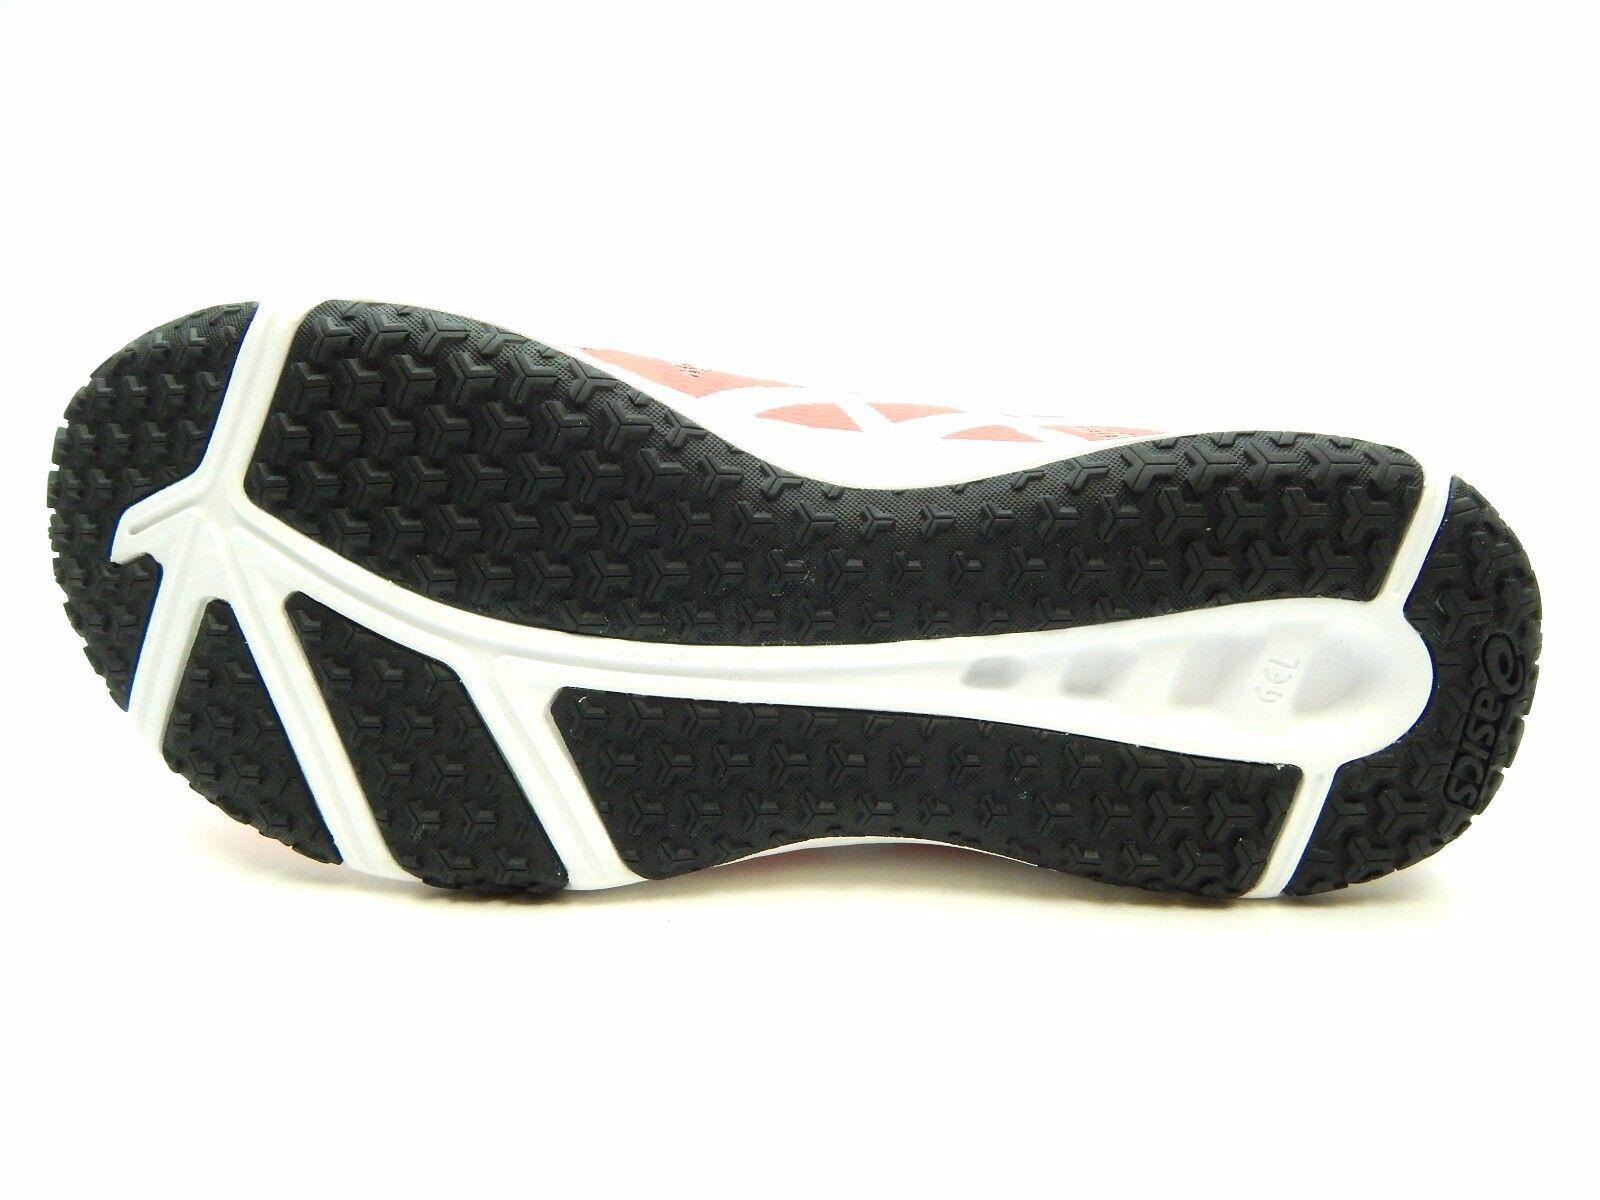 ASICS NITROFUZE TR DIVA SIZE PINK WEISS BLACK WOMEN Schuhe SIZE DIVA 10.5 6e5bda